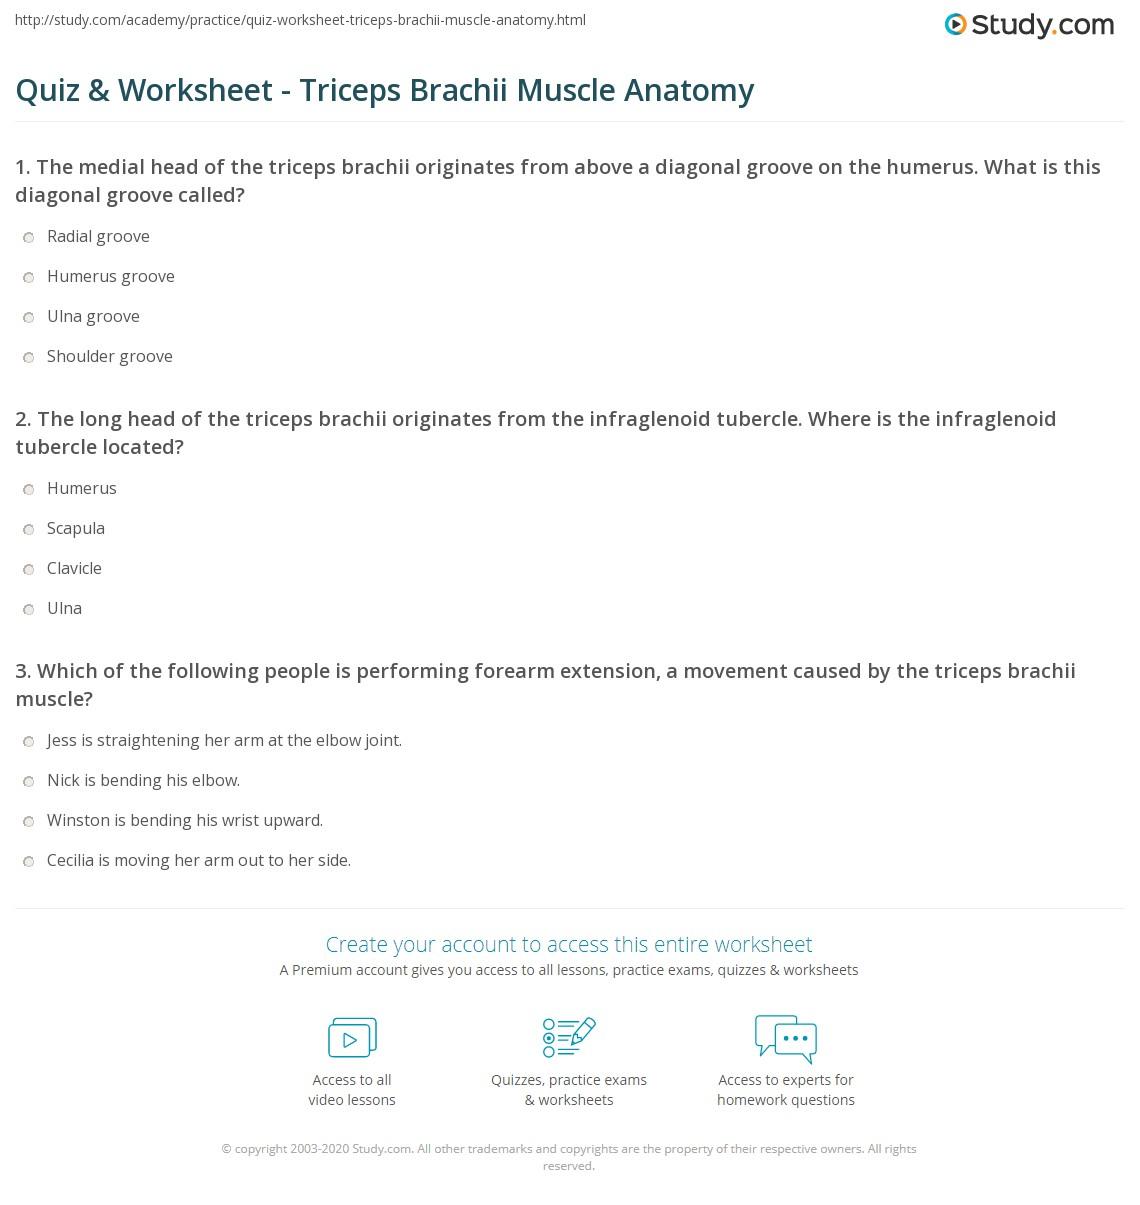 Blank Muscle Worksheet For Anatomy